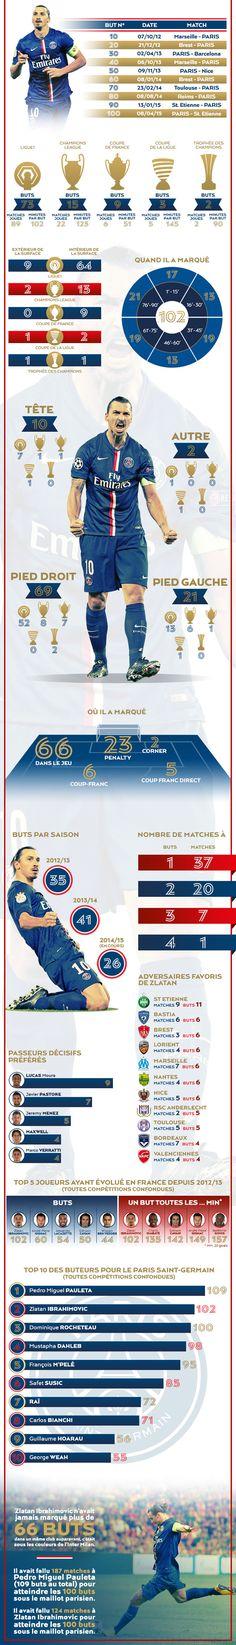 Ses 102 buts en infographie - Zlatan Ibrahimovic - PSG.fr